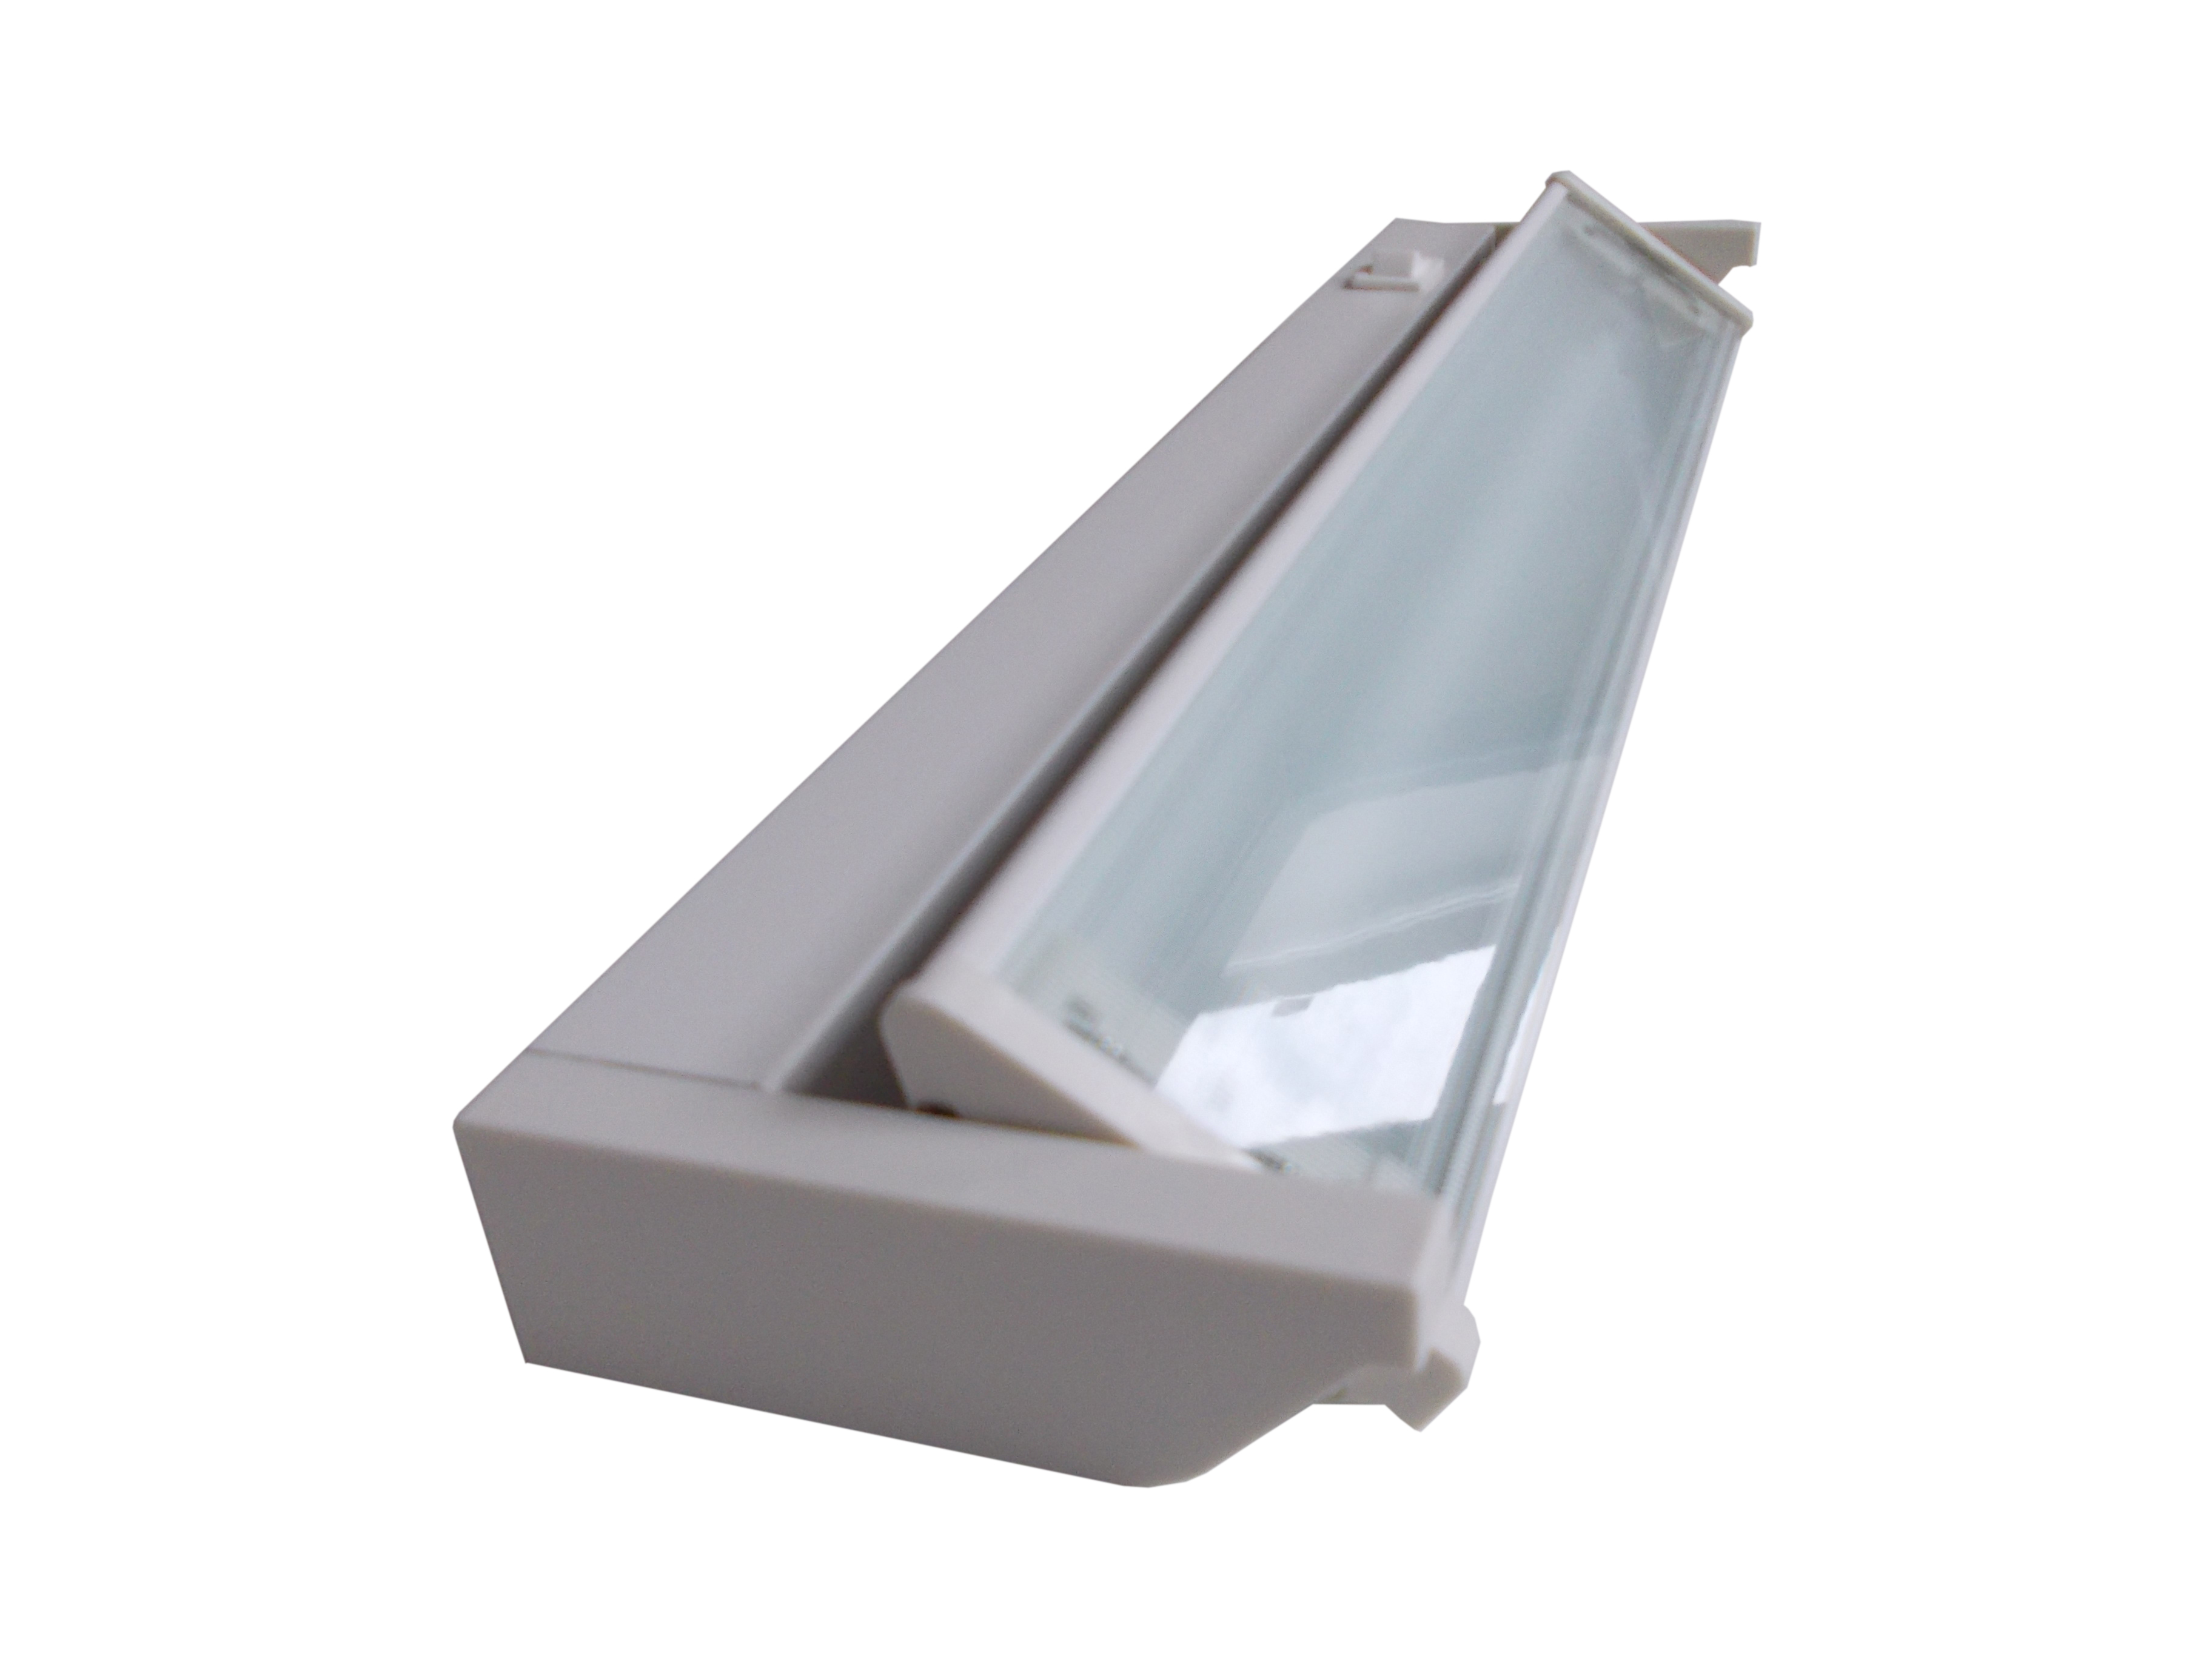 Profilite Kuchyňské svítidlo PL-CAB36-8W bílá s vypínačem PL-CAB36-8W-WHITE-6500K